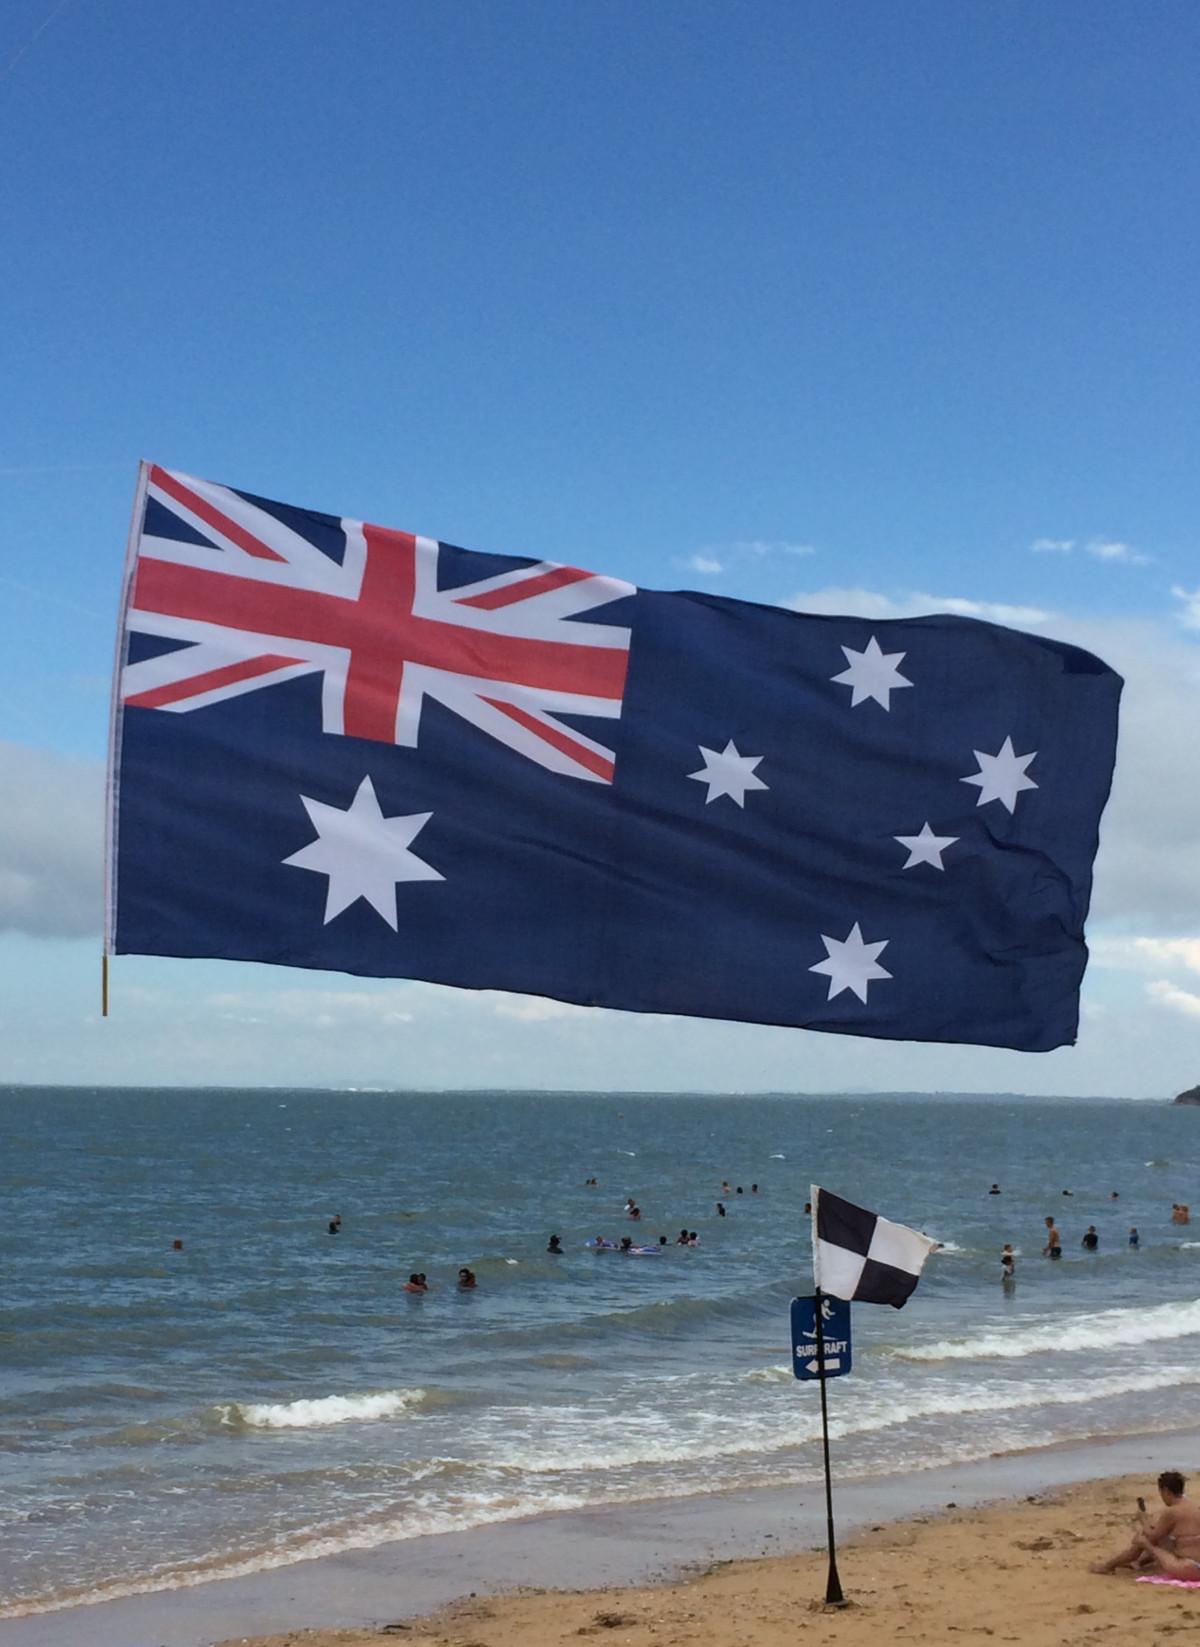 конце августа флаг сша и австралии фото курага еще может